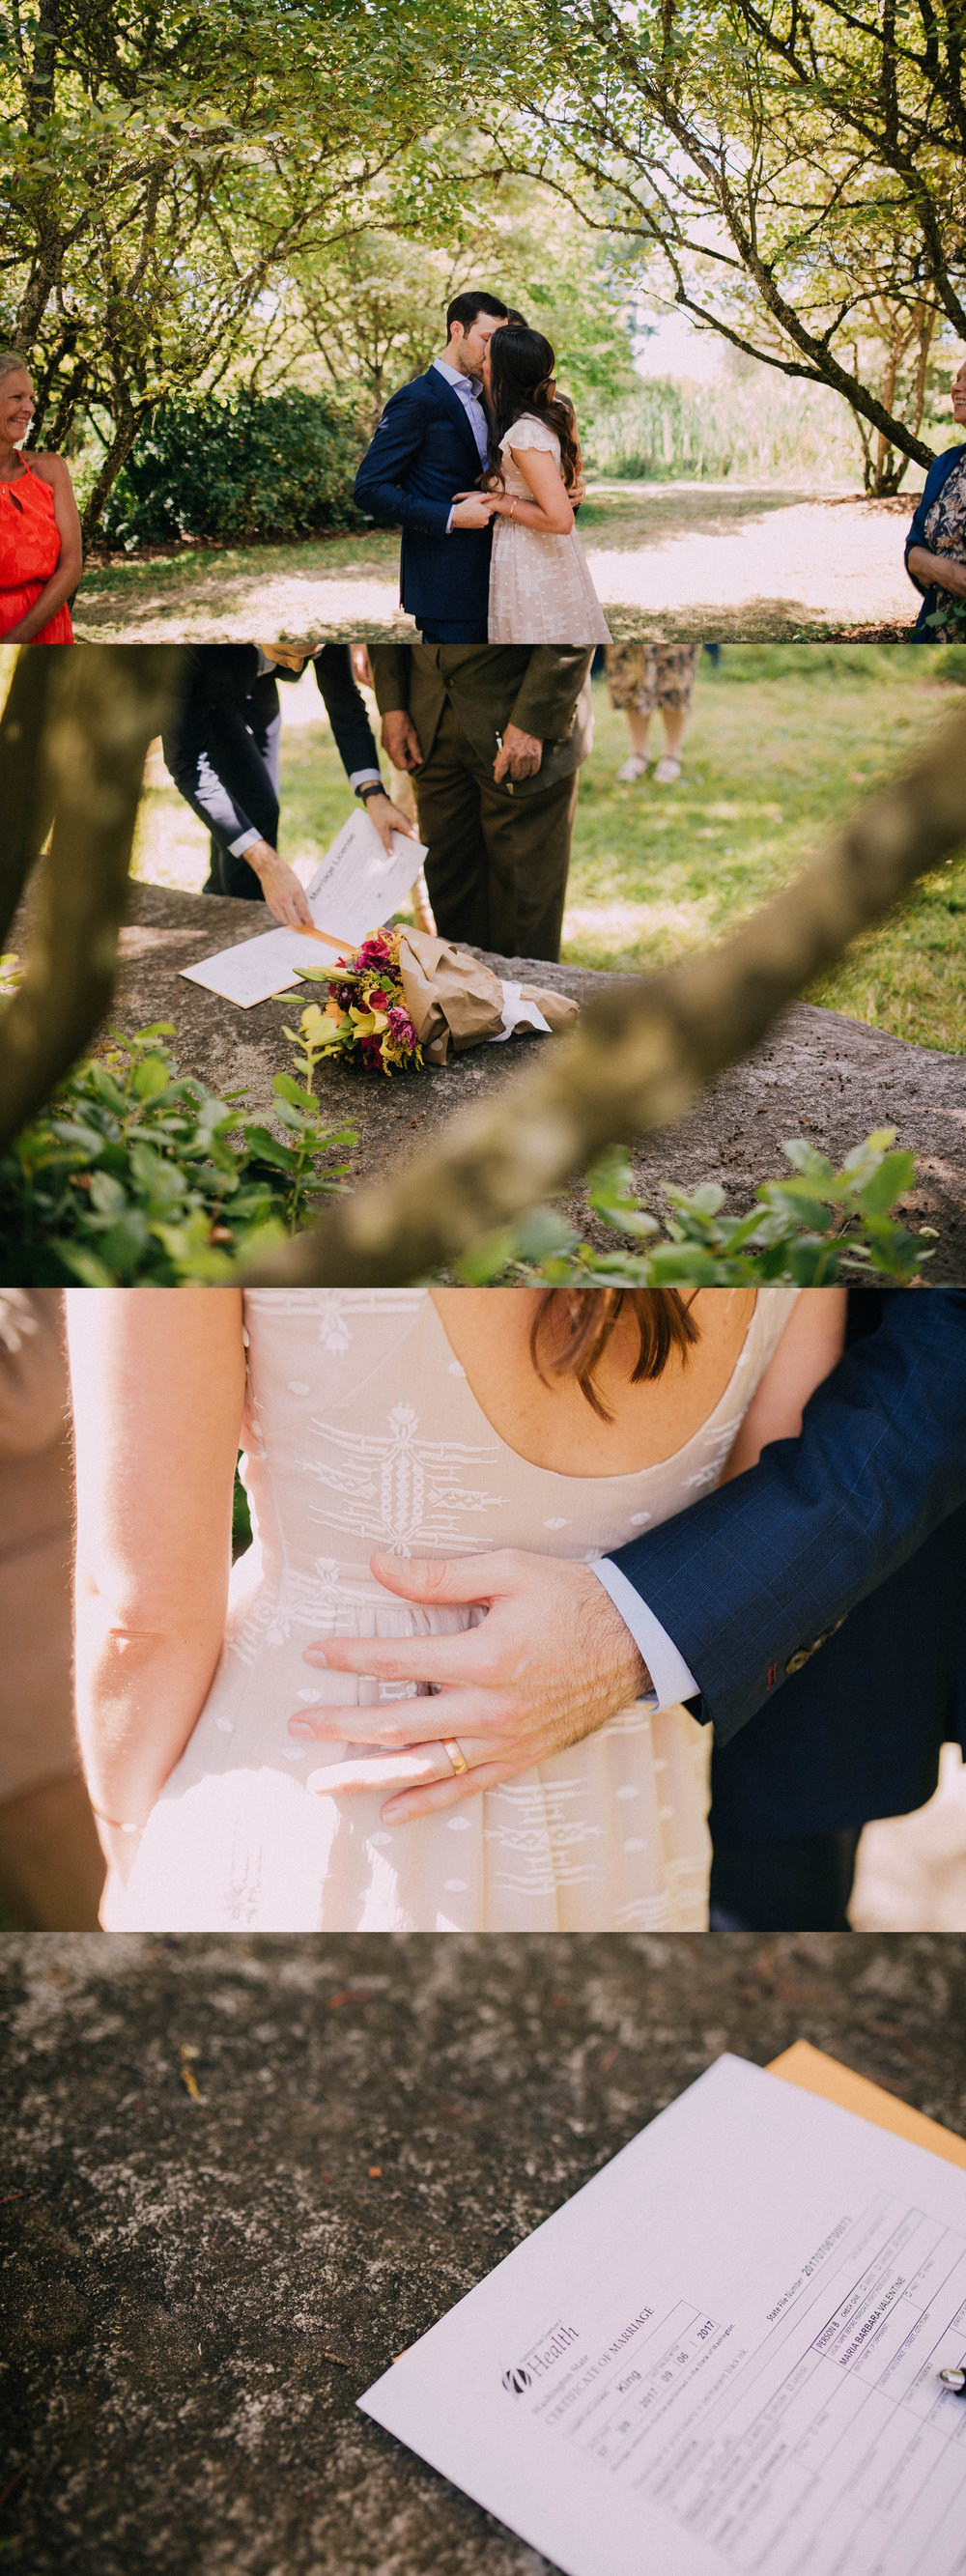 Seattle courthouse and wedding photographer ballard wedding ashley vos-4.jpg